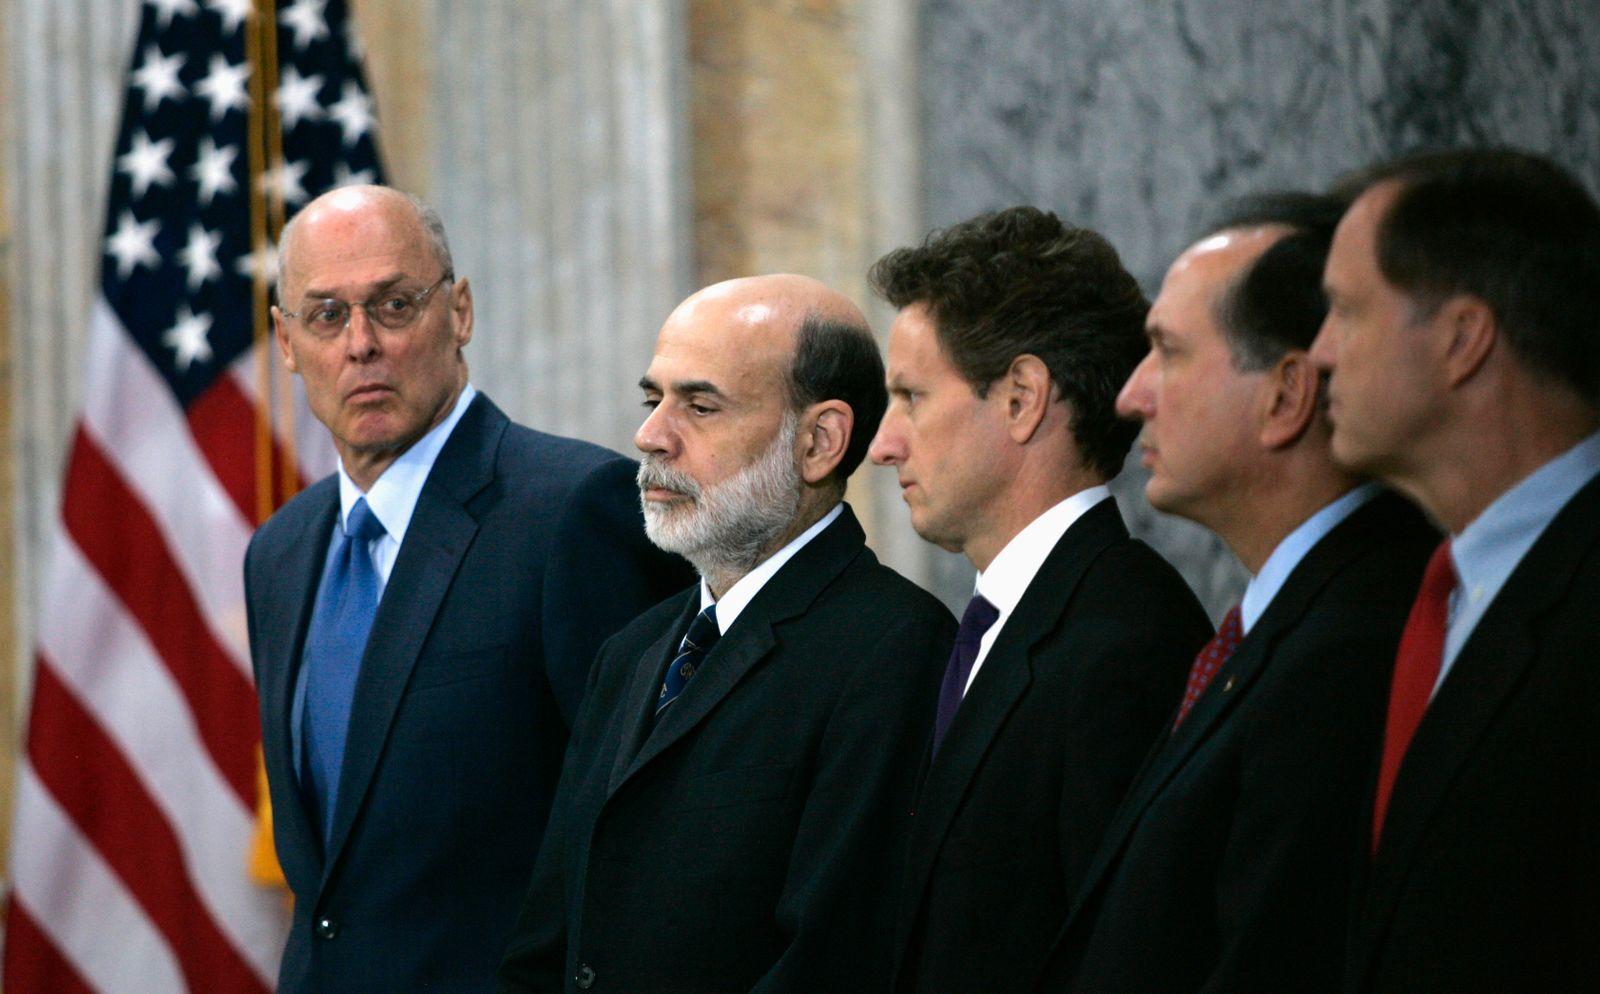 Henry Paulson / Ben Bernanke / Timothy F. Geithner